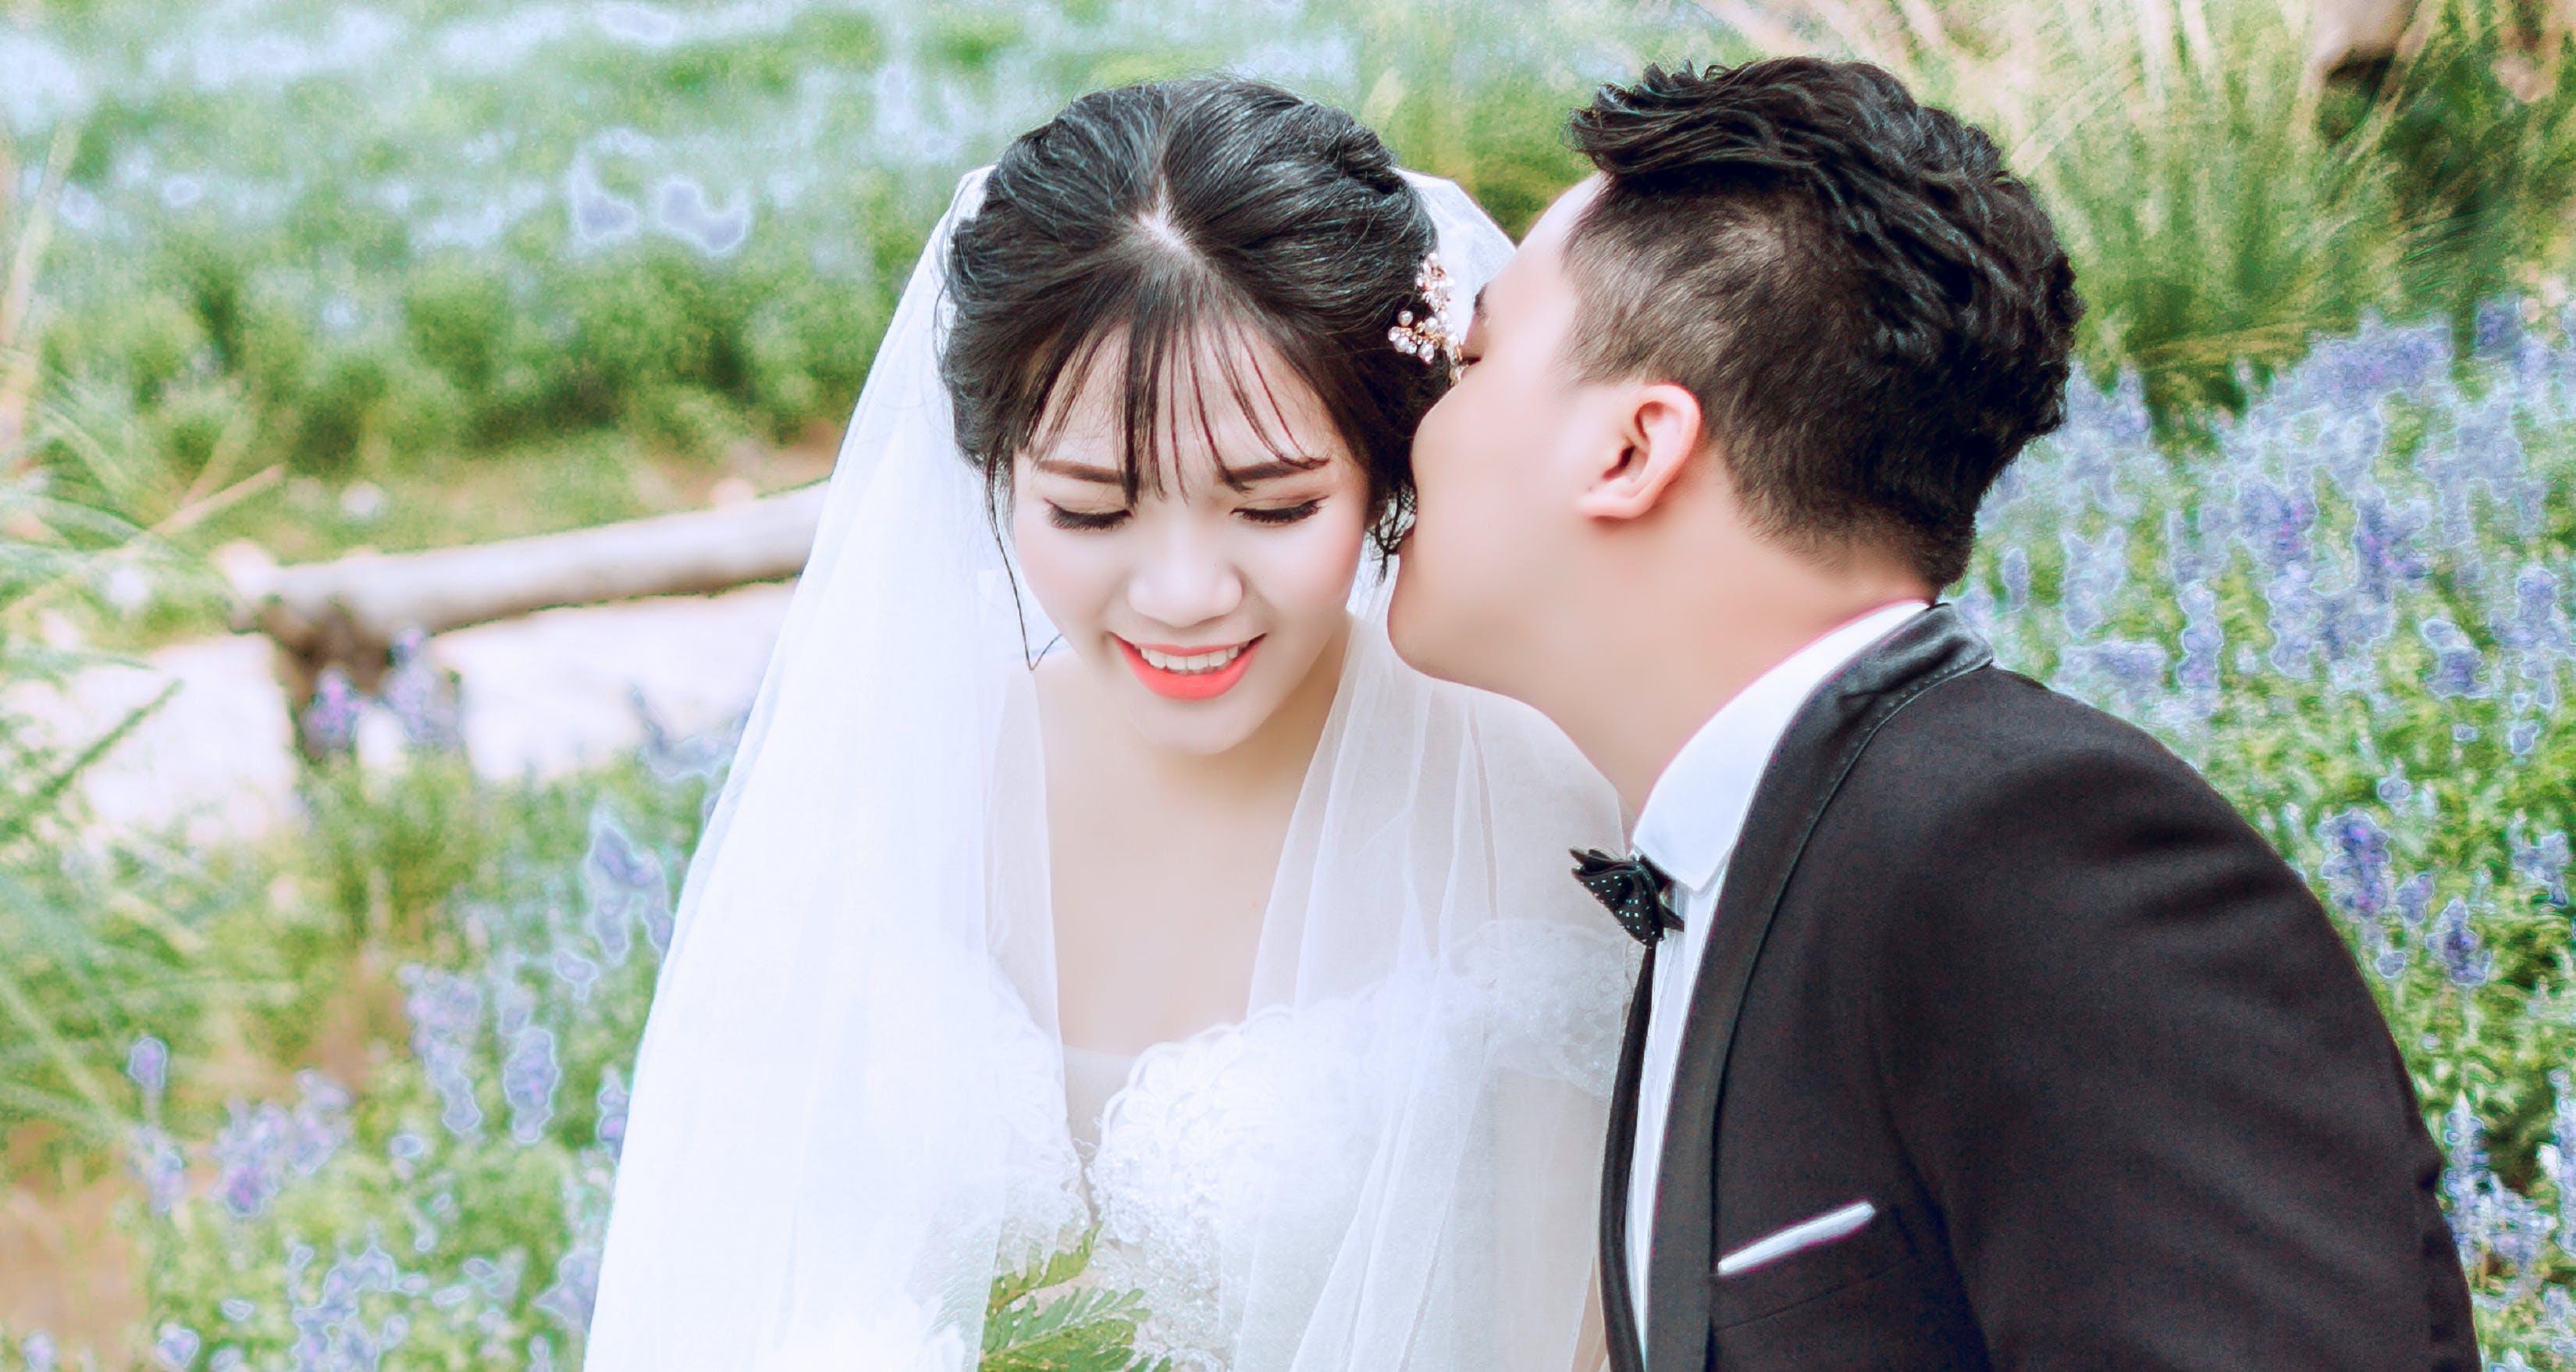 Groom Kissing Bride on Left Cheek